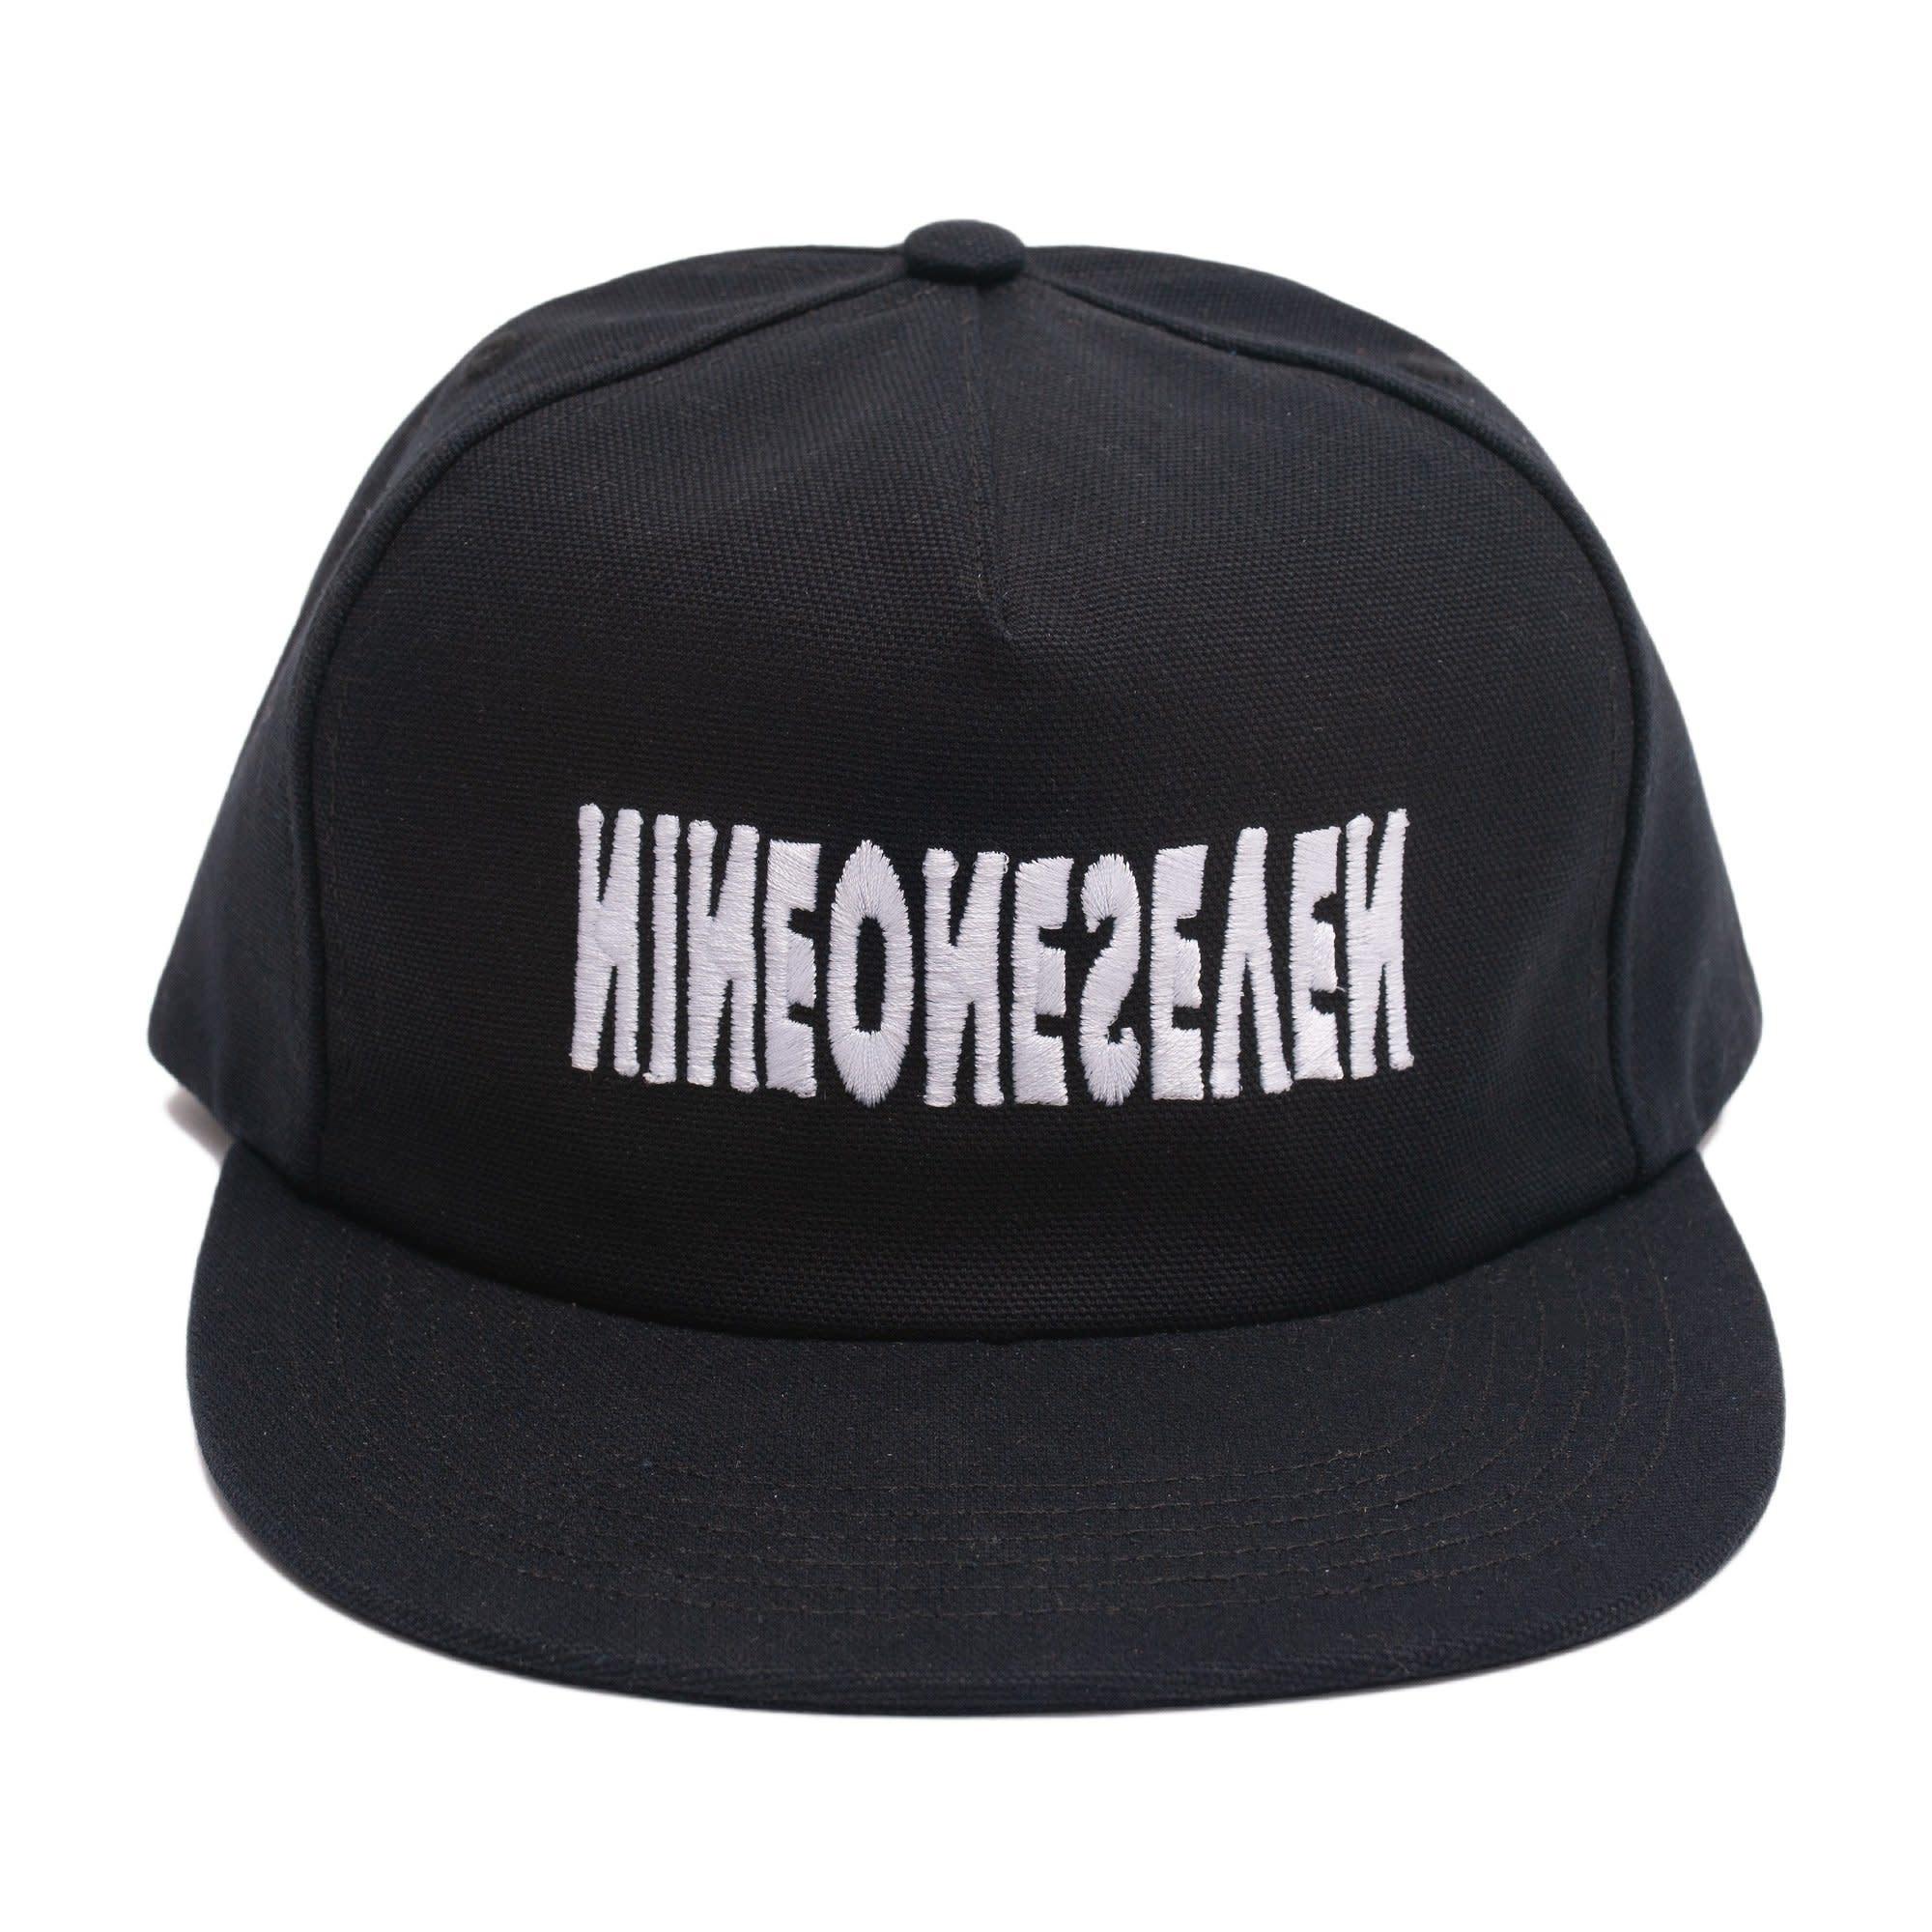 Call Me 917 Cyber Logo Hat Black